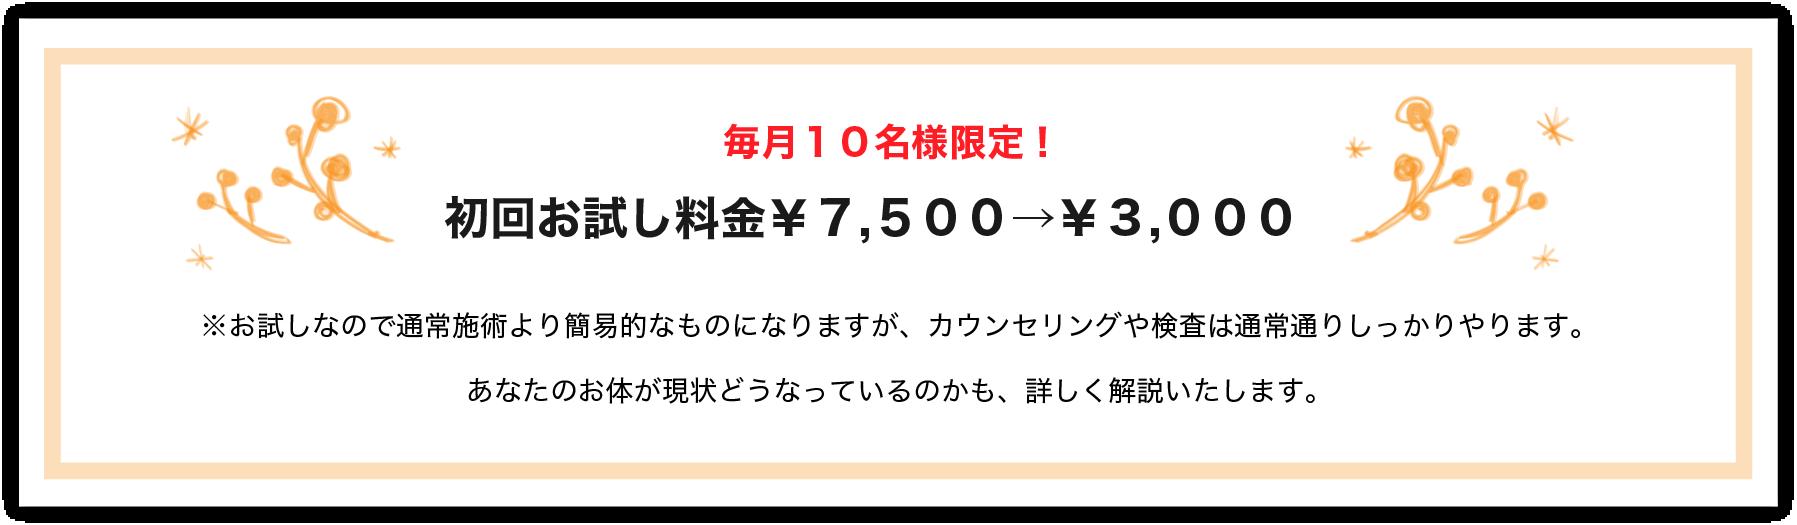 sozai 24 - 当施設紹介